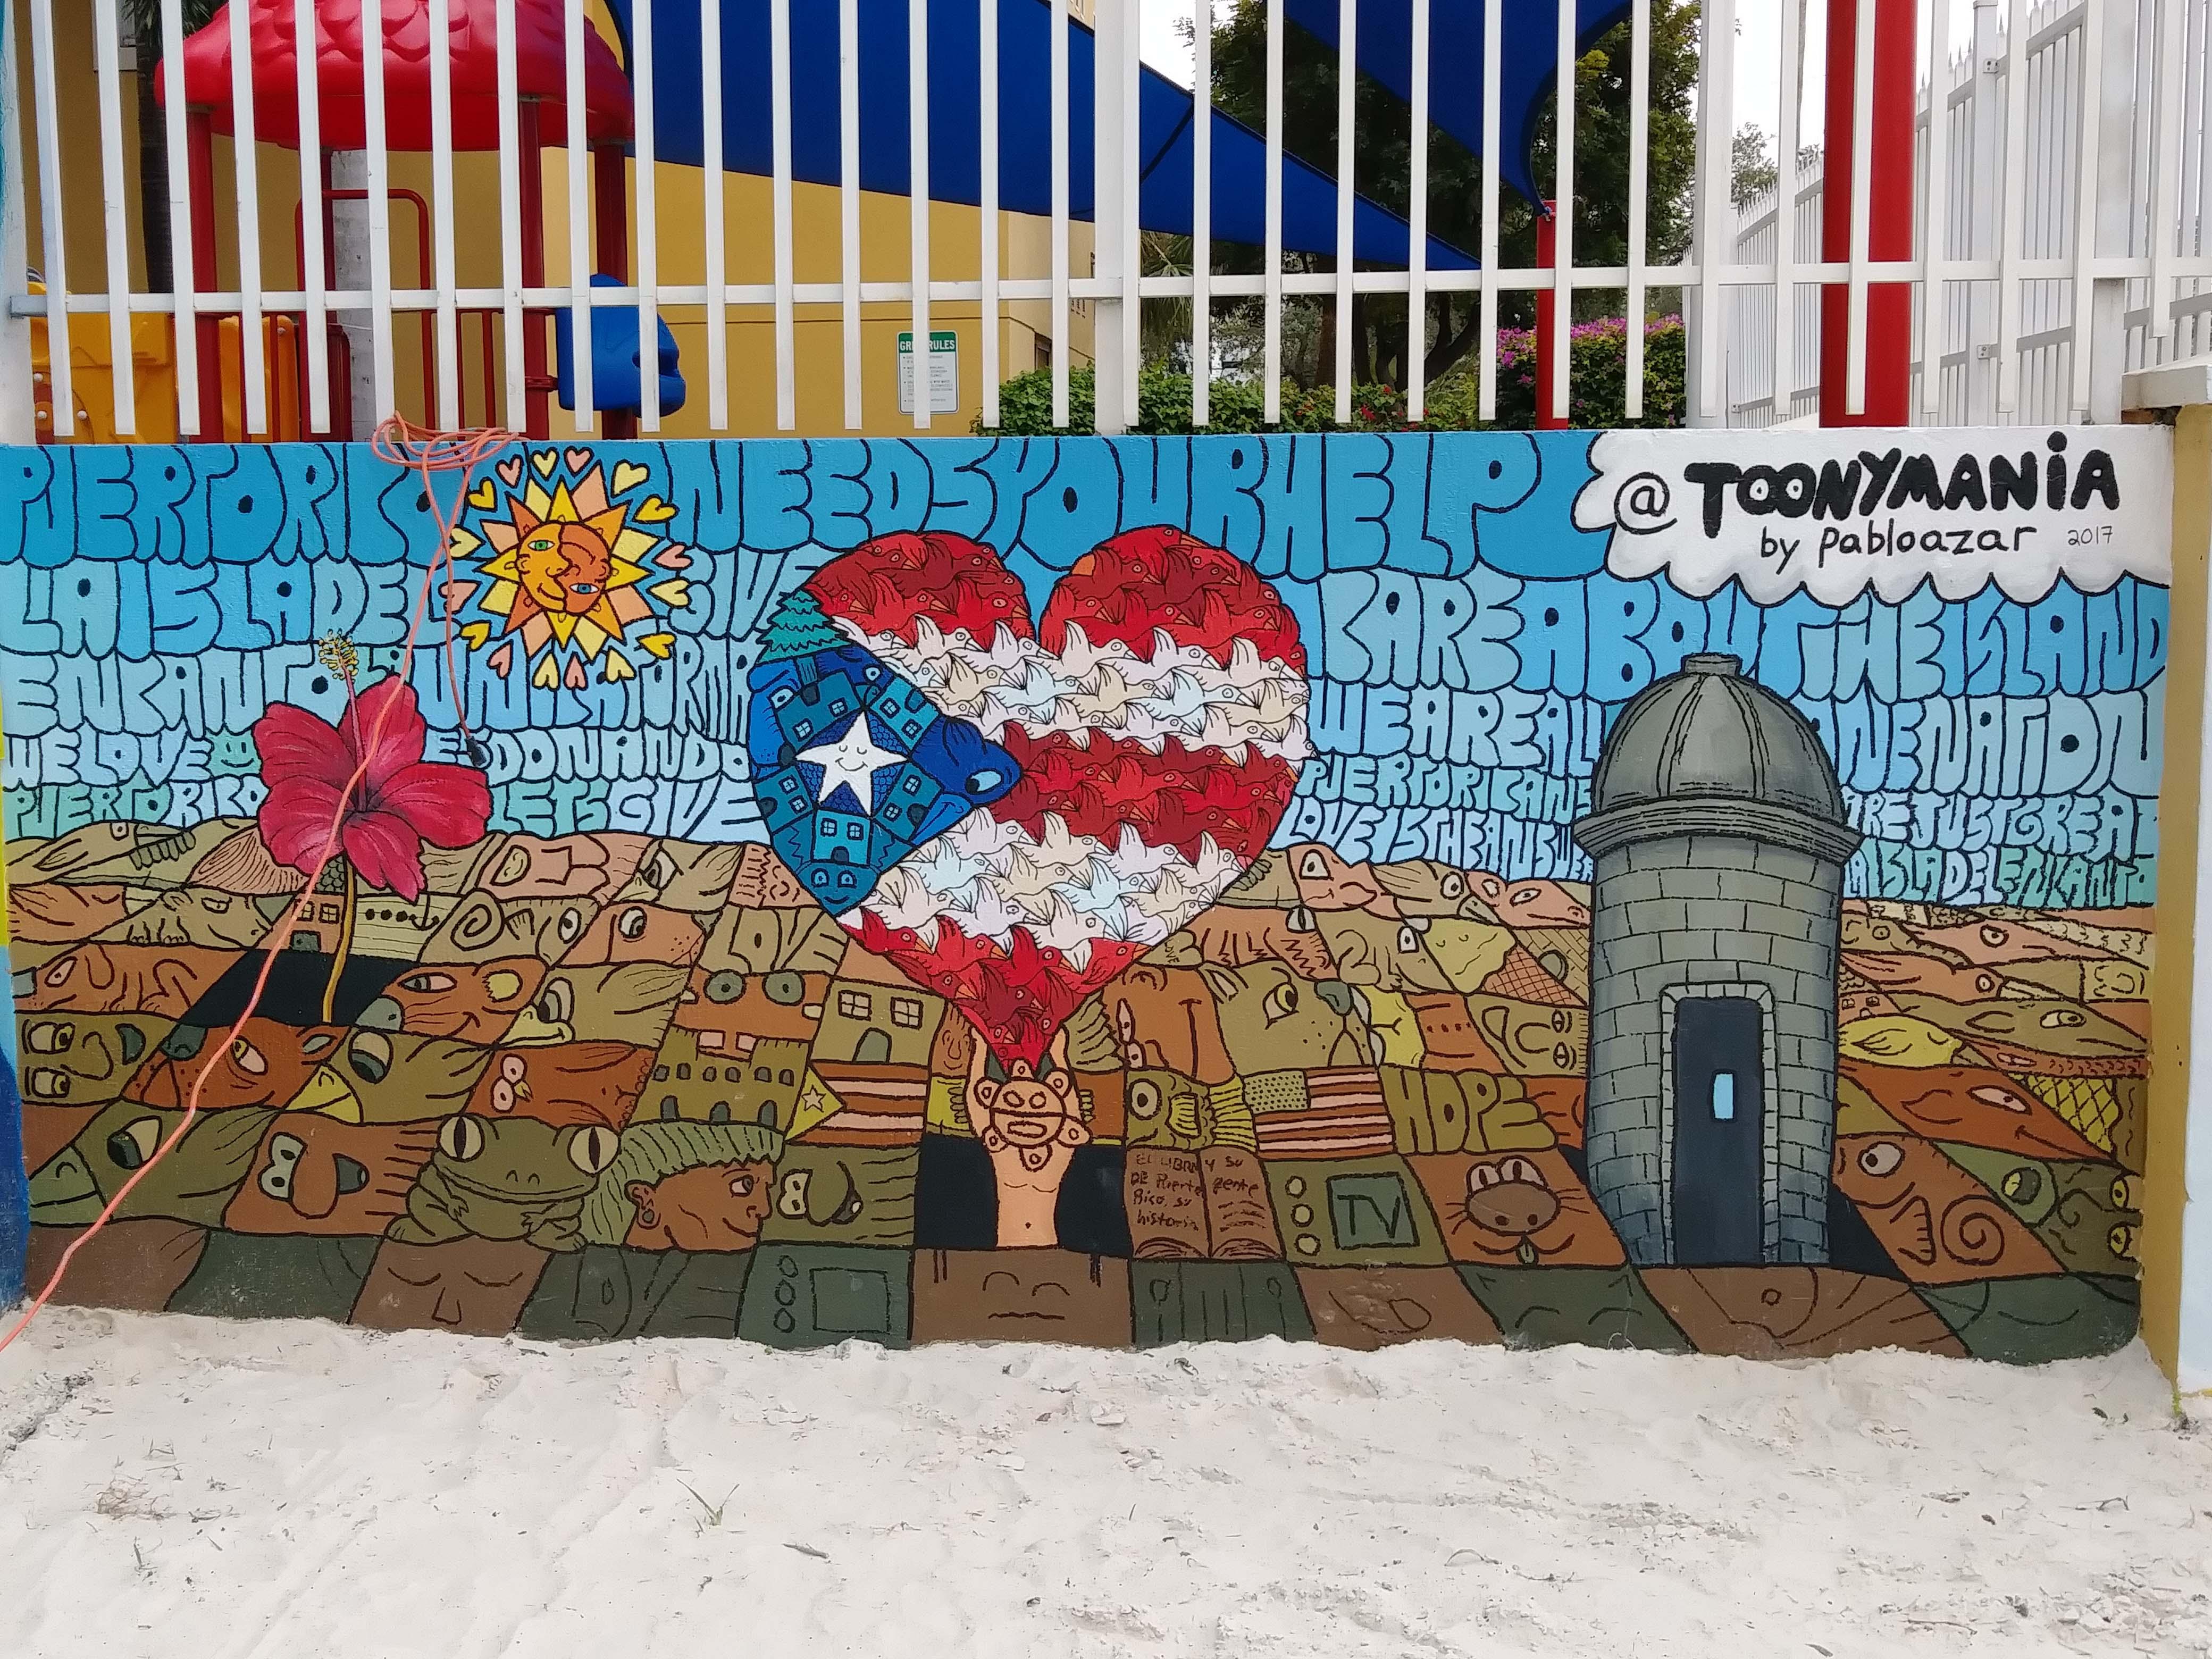 Puerto Rico Hope